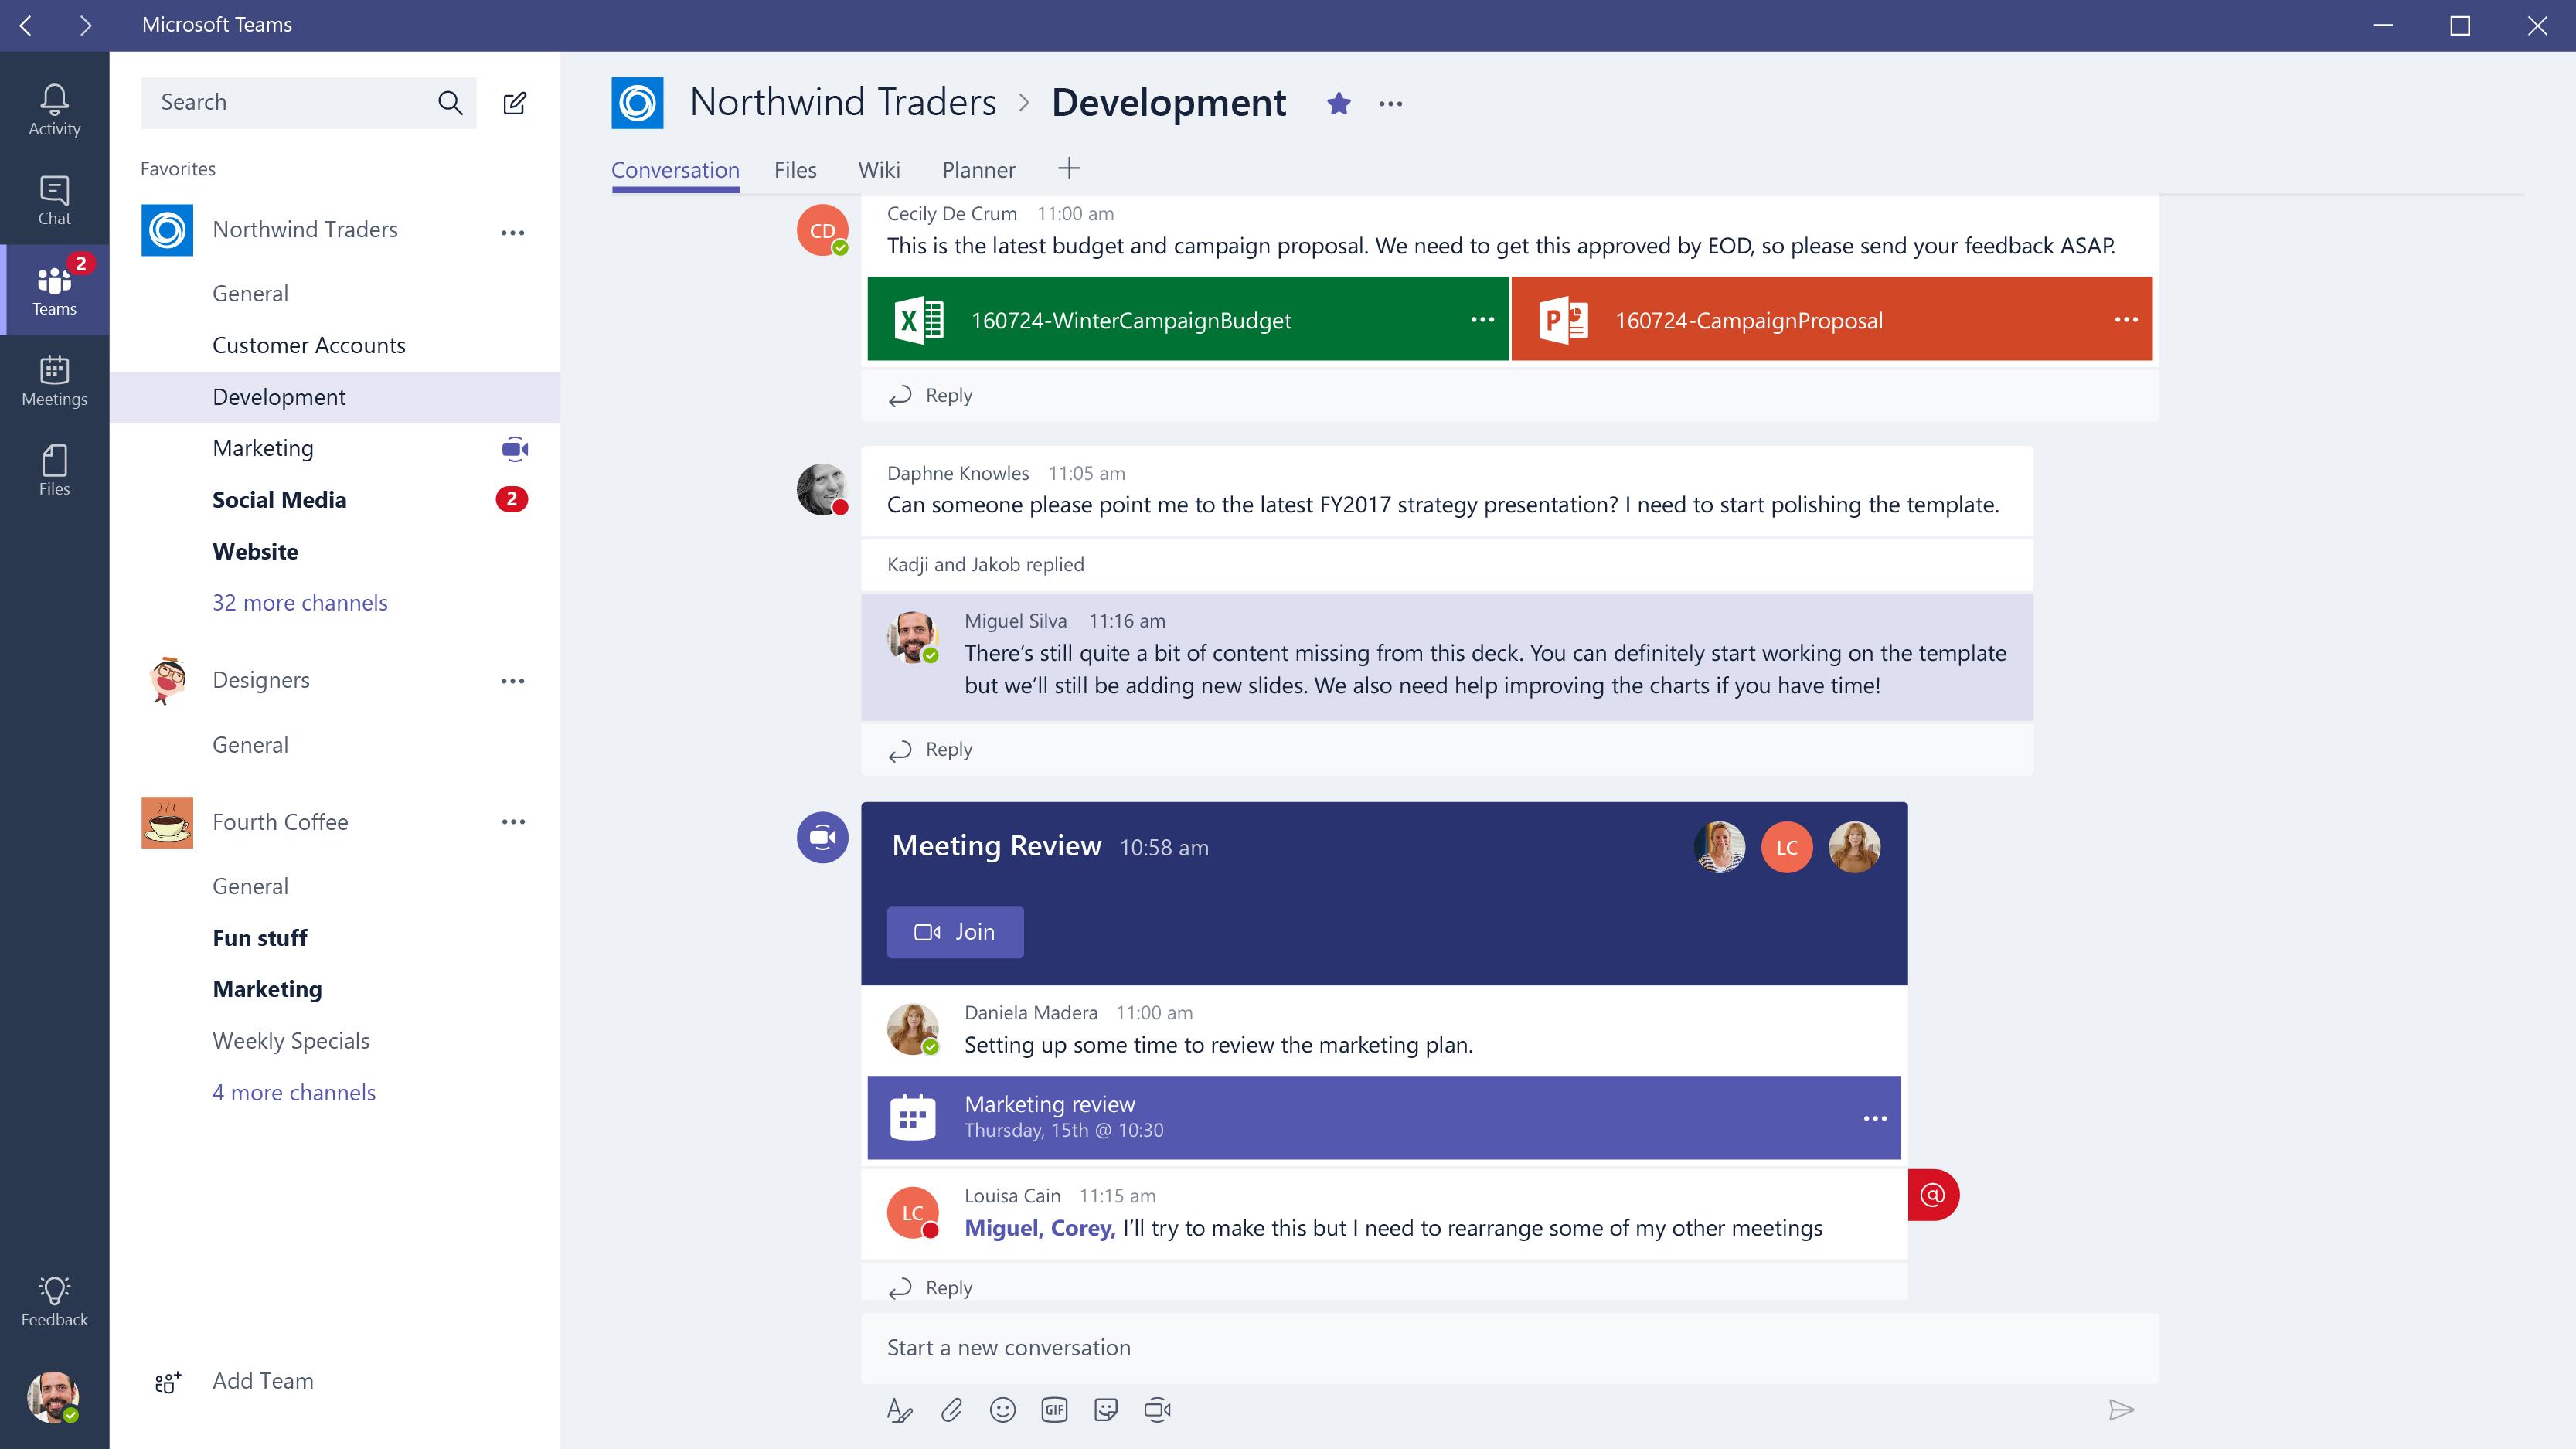 Microsoft teams content